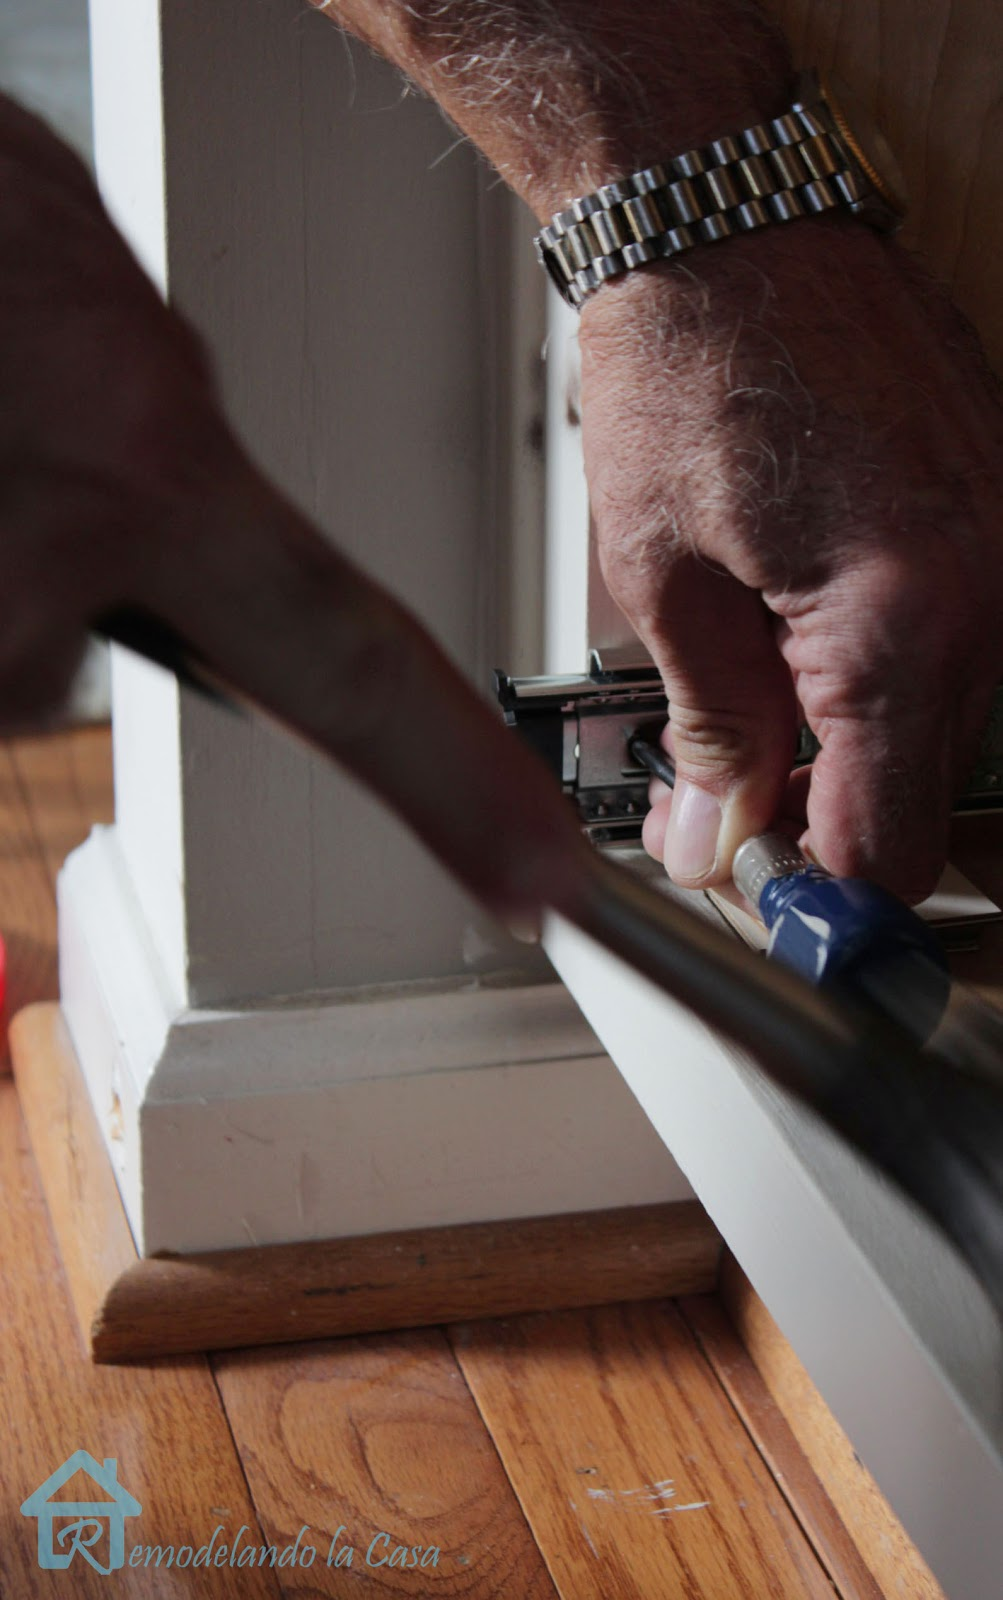 remodelando la casa kitchen organization pull out shelves in pantry